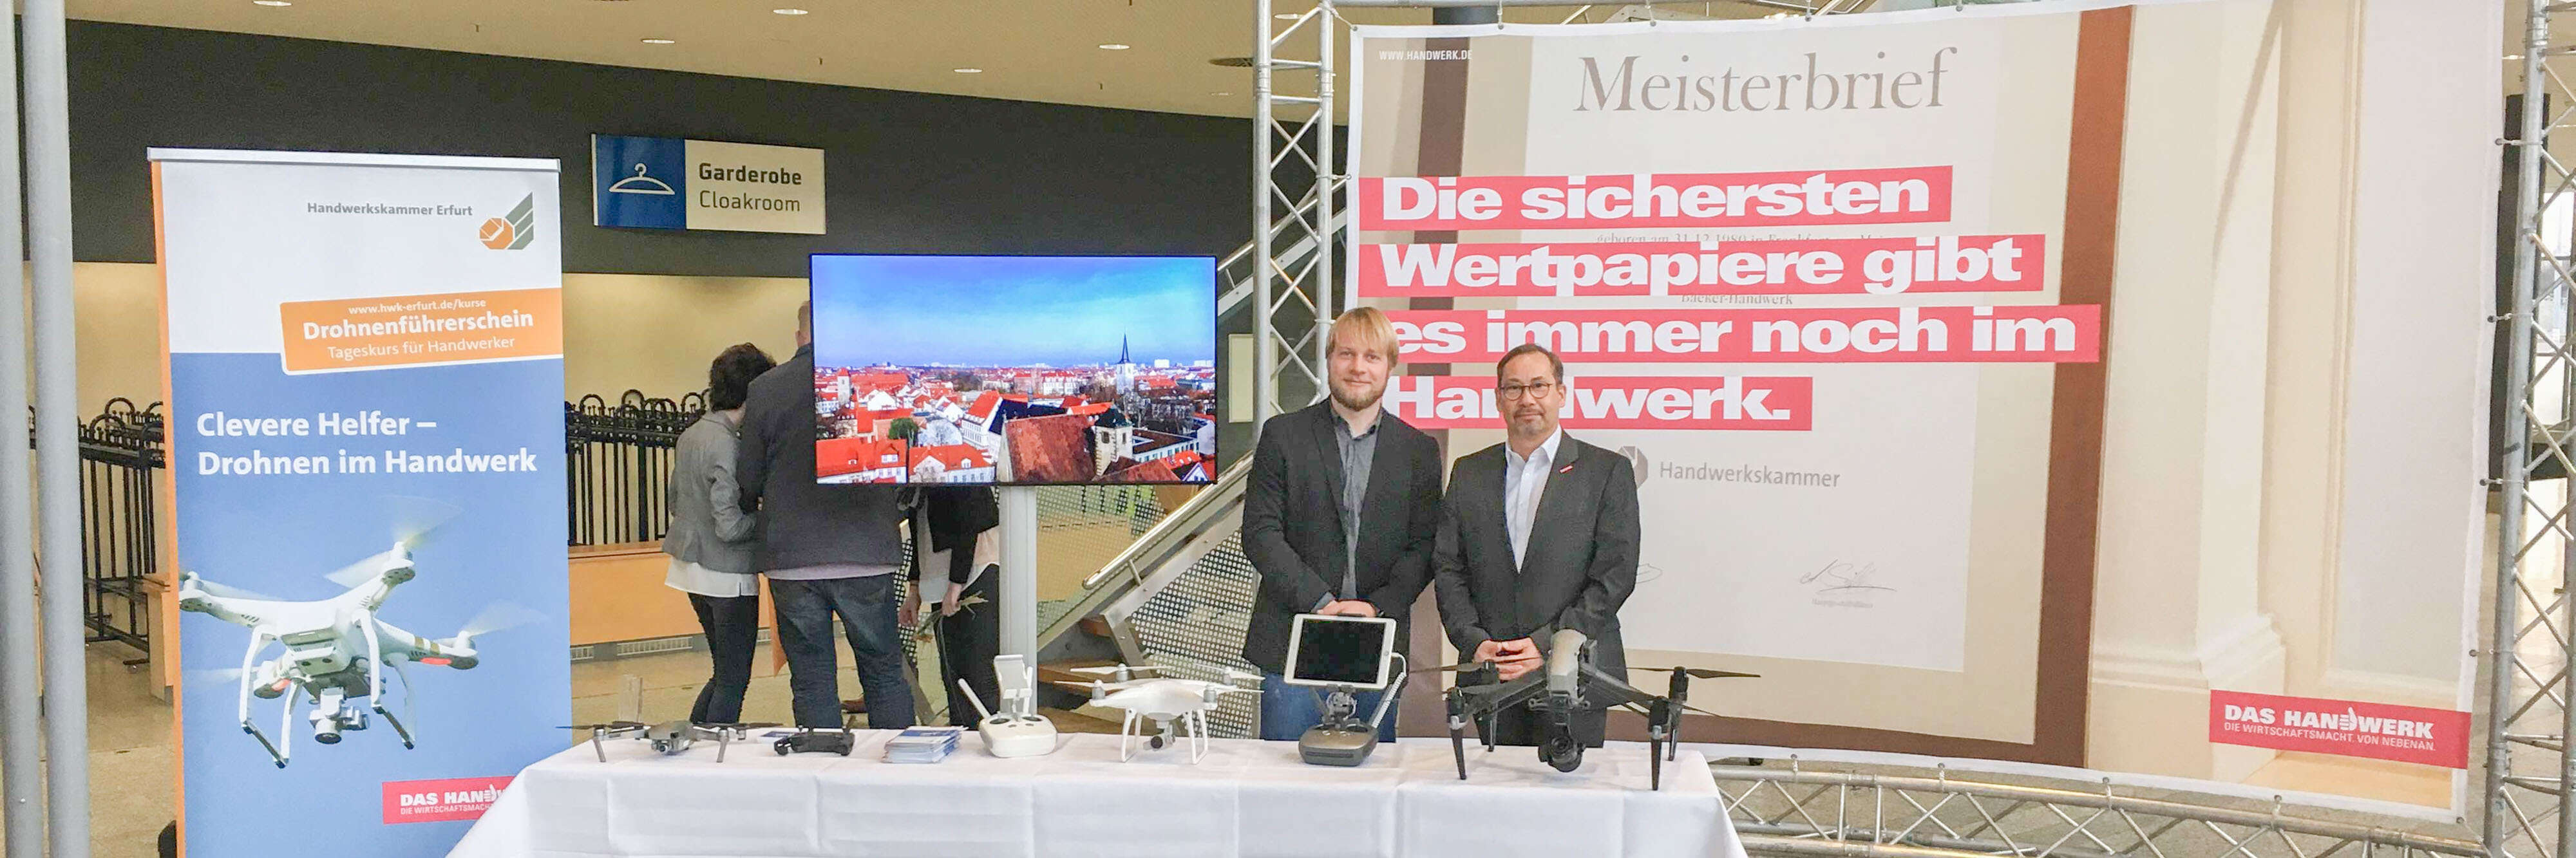 Meisterfeier 2019 Erfurt